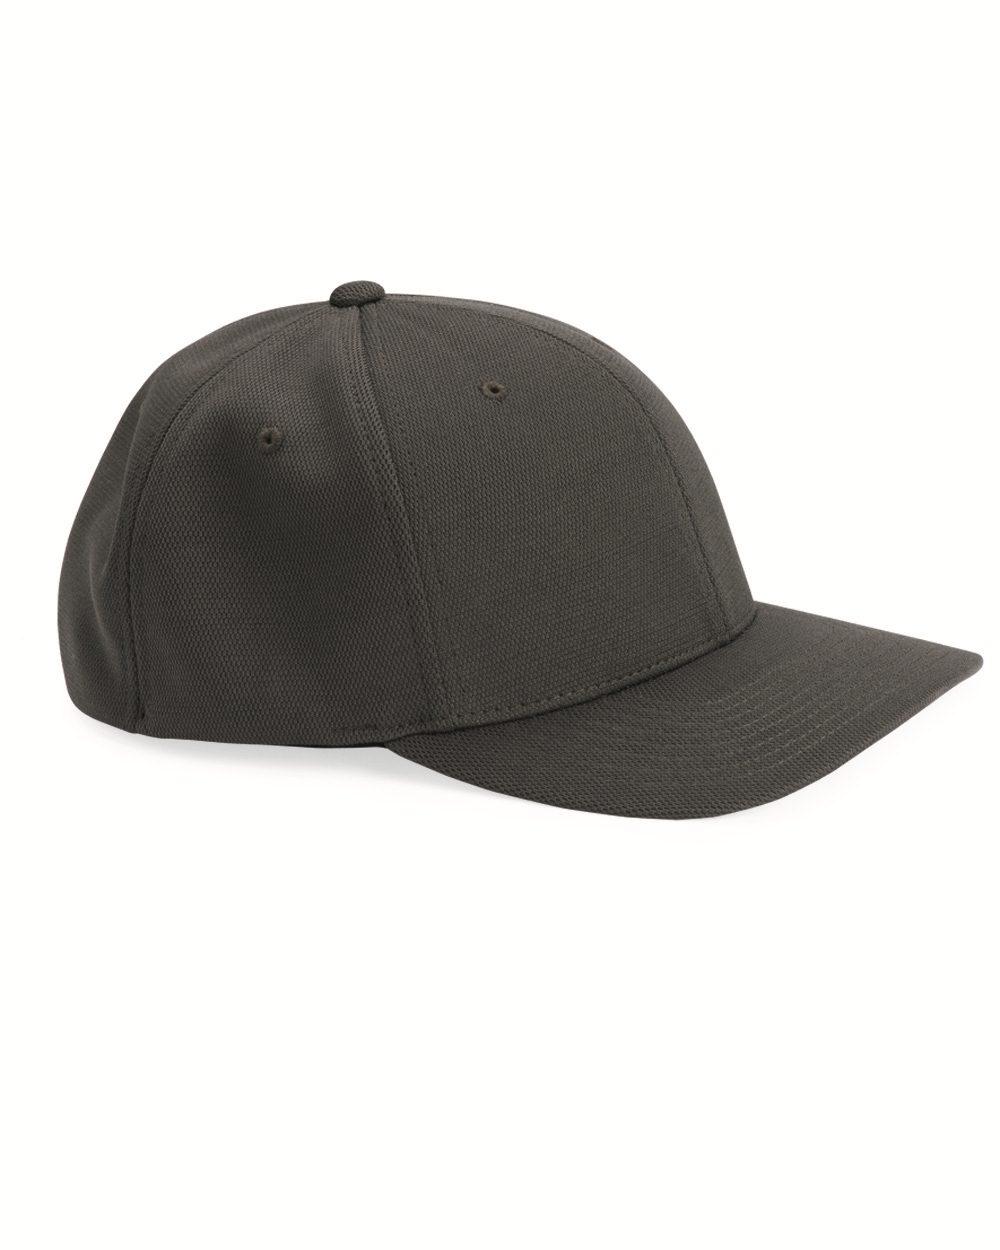 Flexfit Cool & Dry Sport Cap - 6597